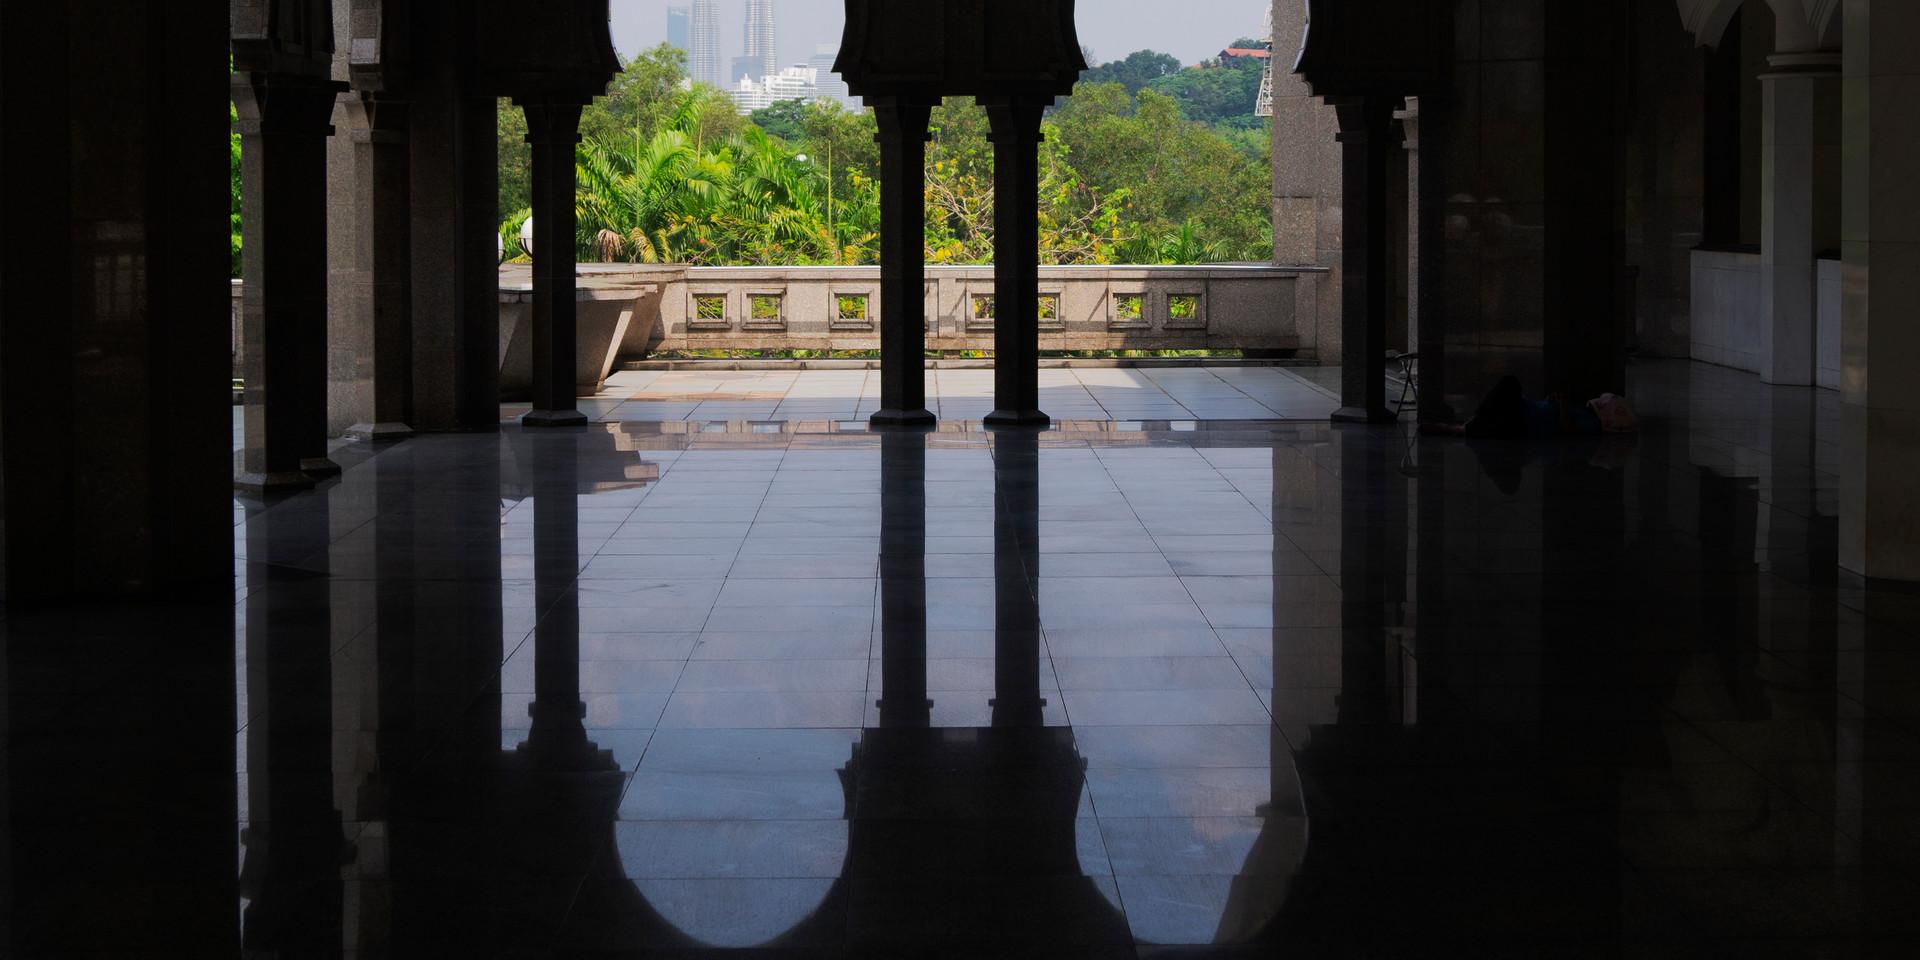 Masjid Wilayah Persekutuan